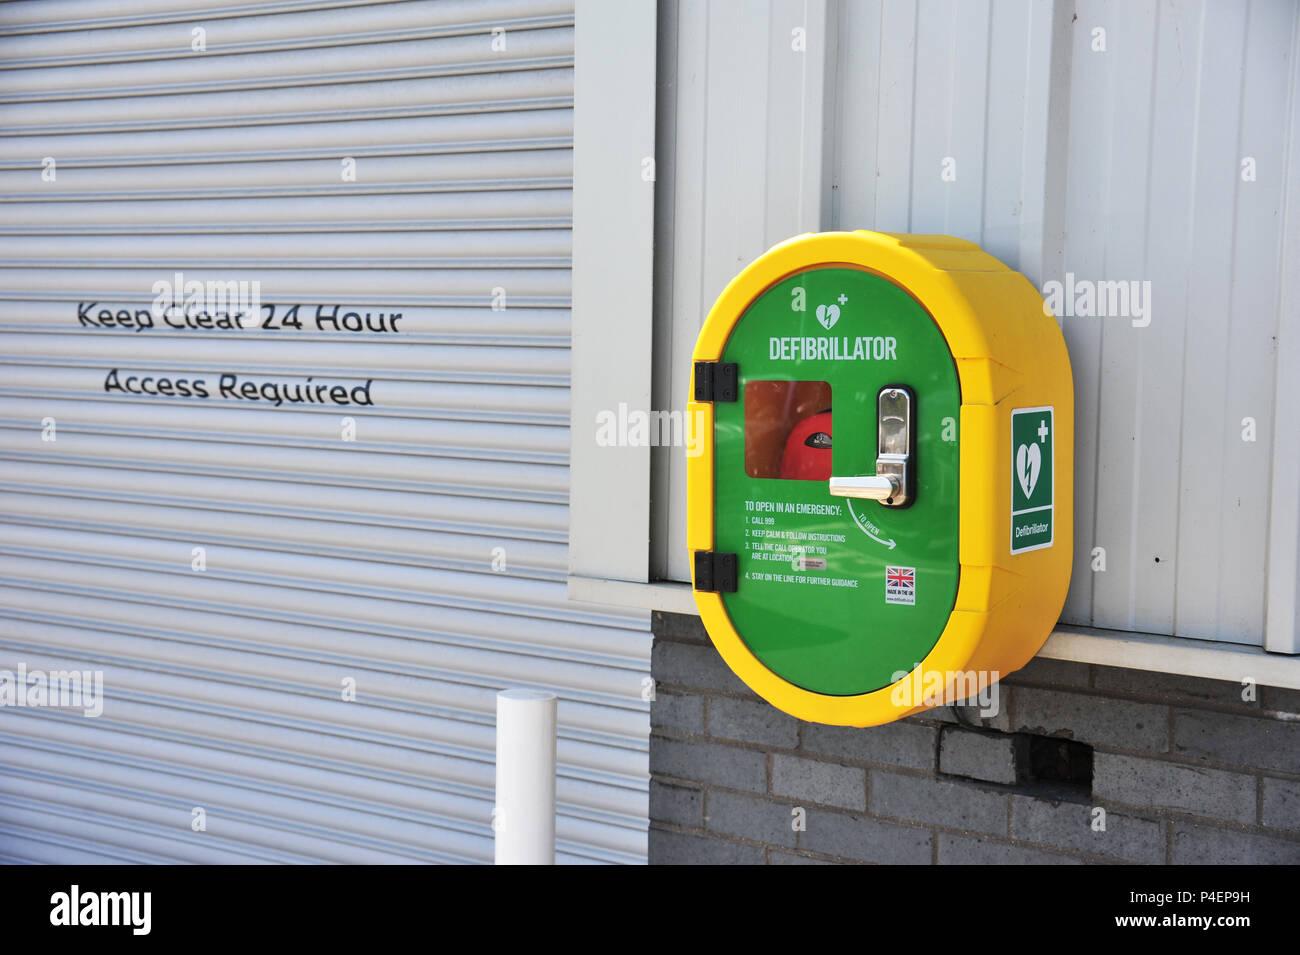 Life saving Defibrillator on the wall of the Audi Car Showroom - Stock Image